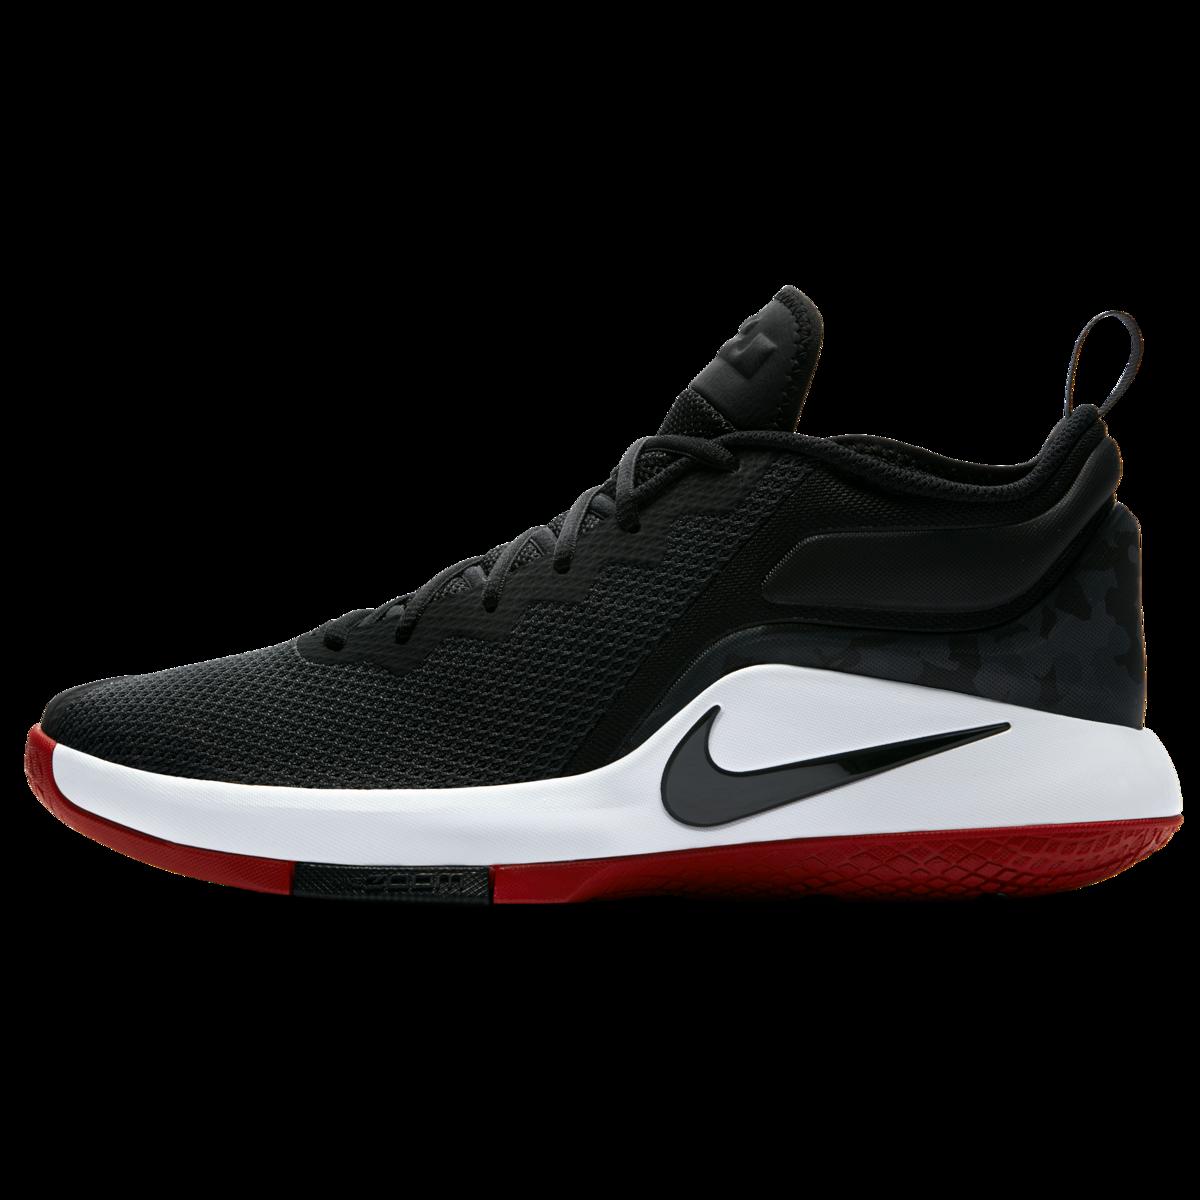 Lebron Shoes Price List